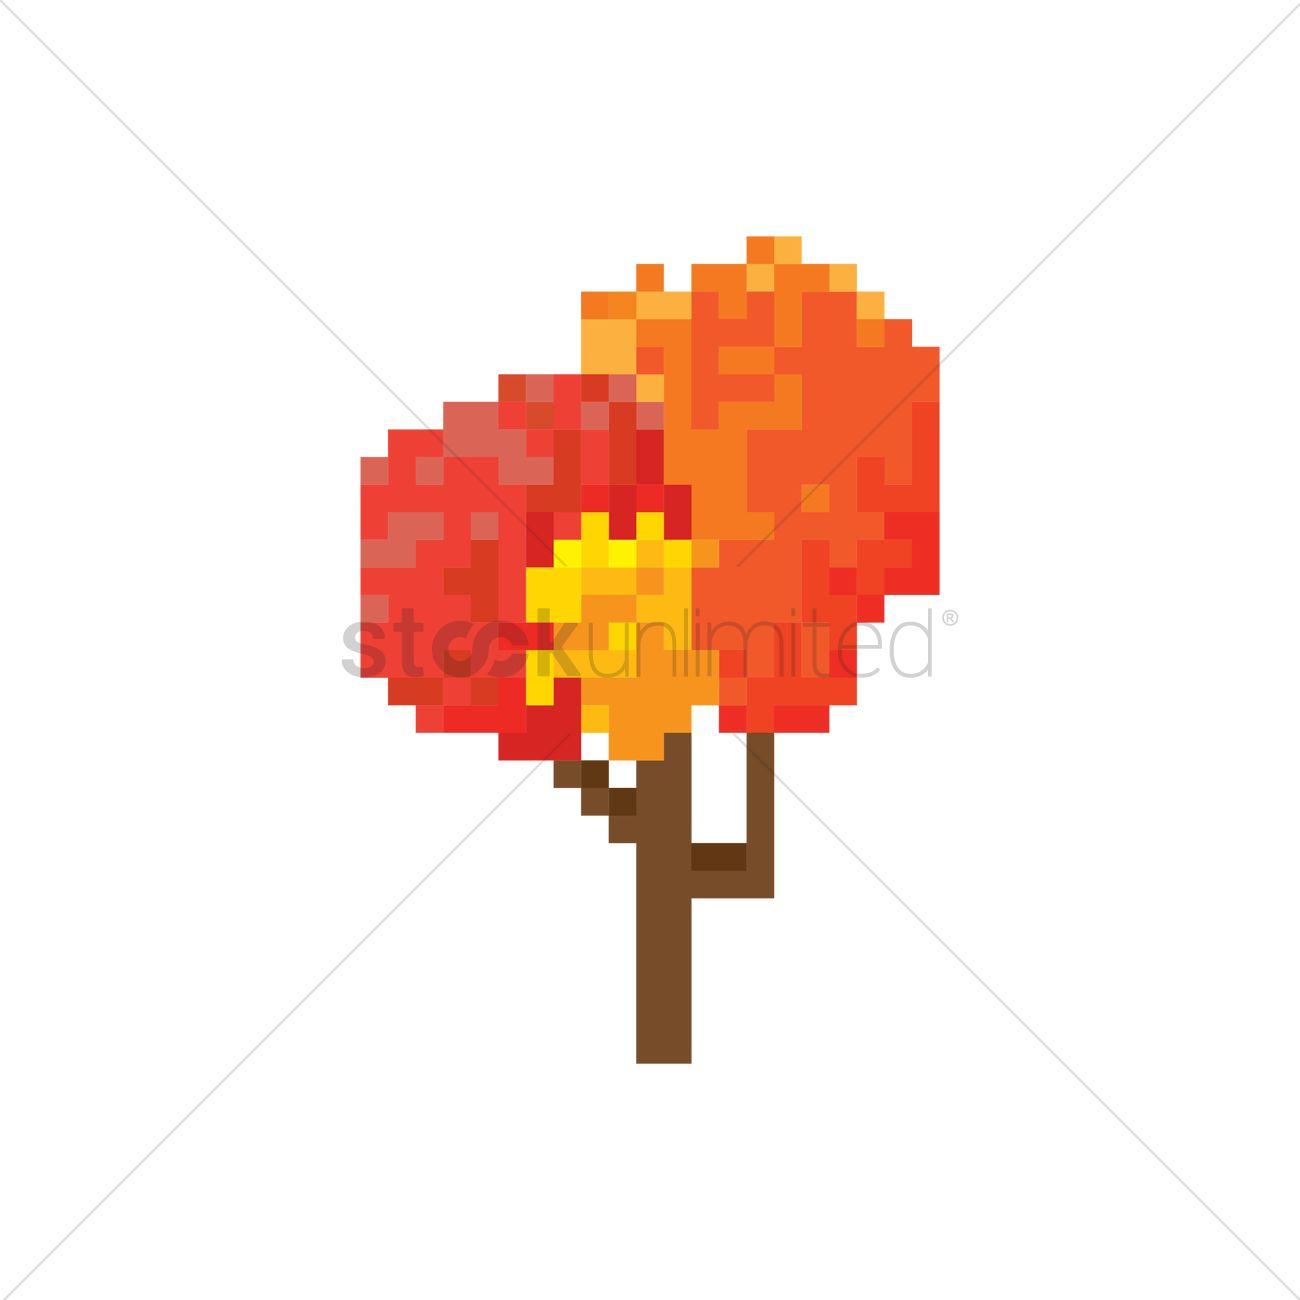 Autumn Leaf Pixel Art Wiring Diagrams 20022004 Ford F250 Curt T Connector Harness 55265 Pixels Pixelate Pixelated 8 Bit 8bit Tree Trees Rh Stockunlimited Com The